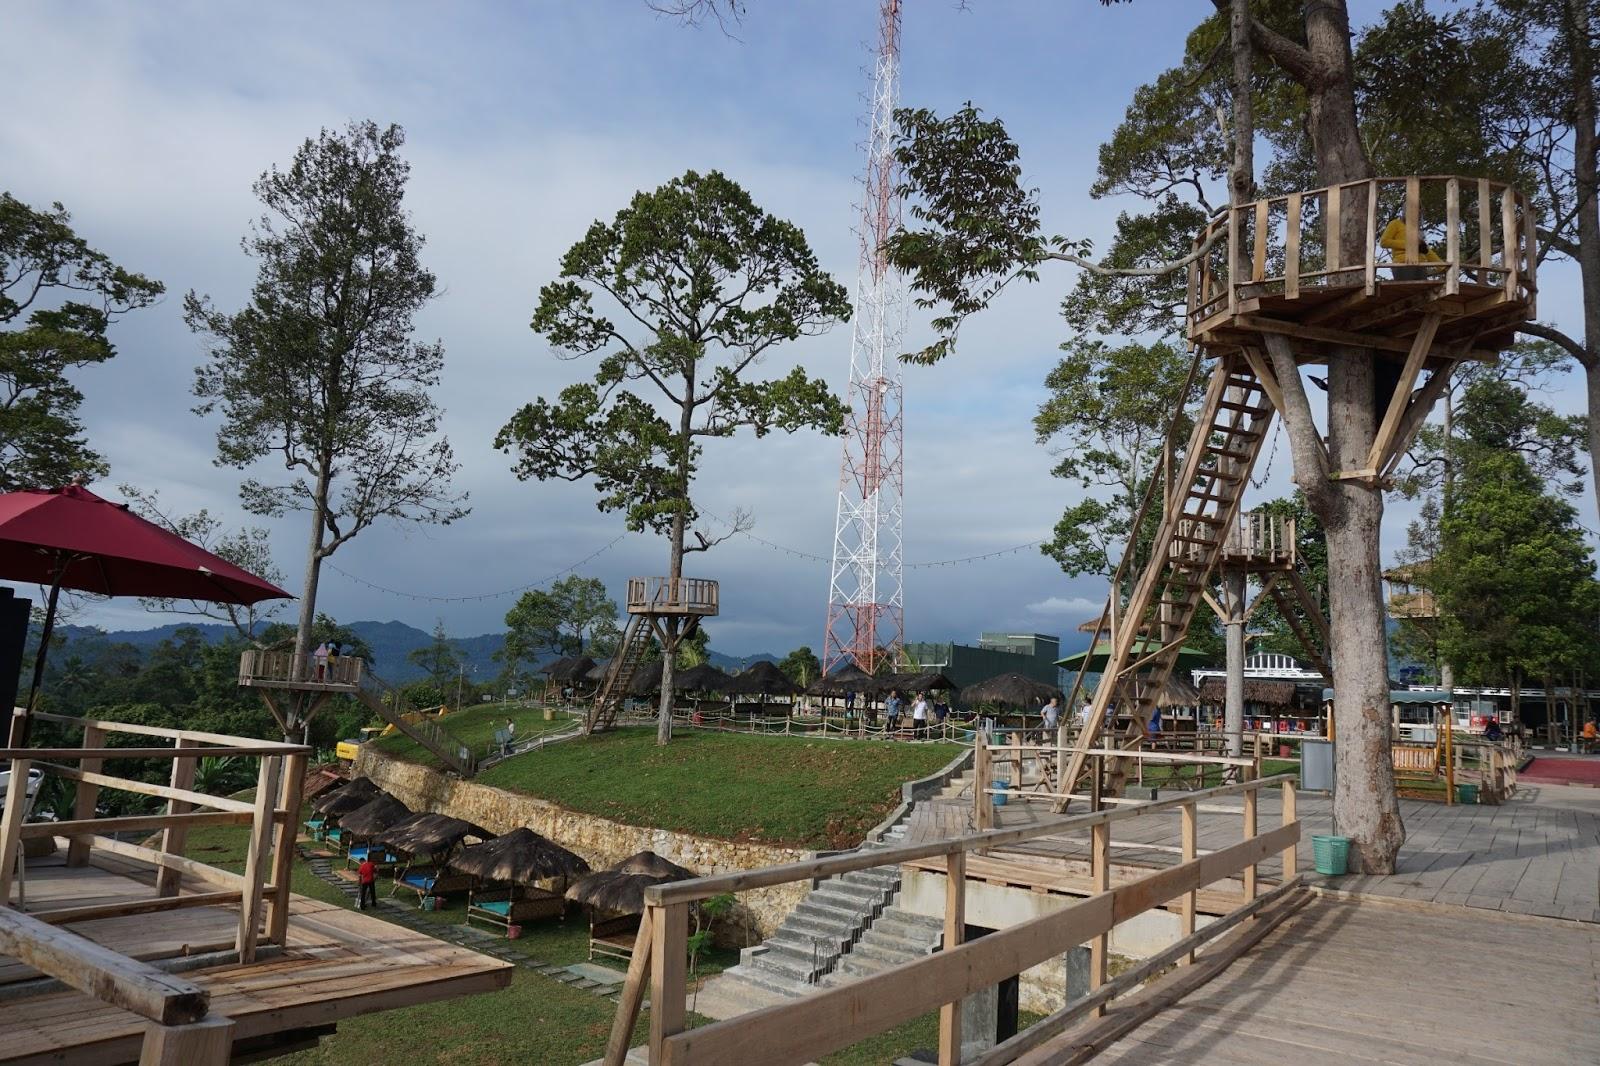 Menikmati Kota Bandarlampung Puncak Mas Lampungupdate Bandar Lampung